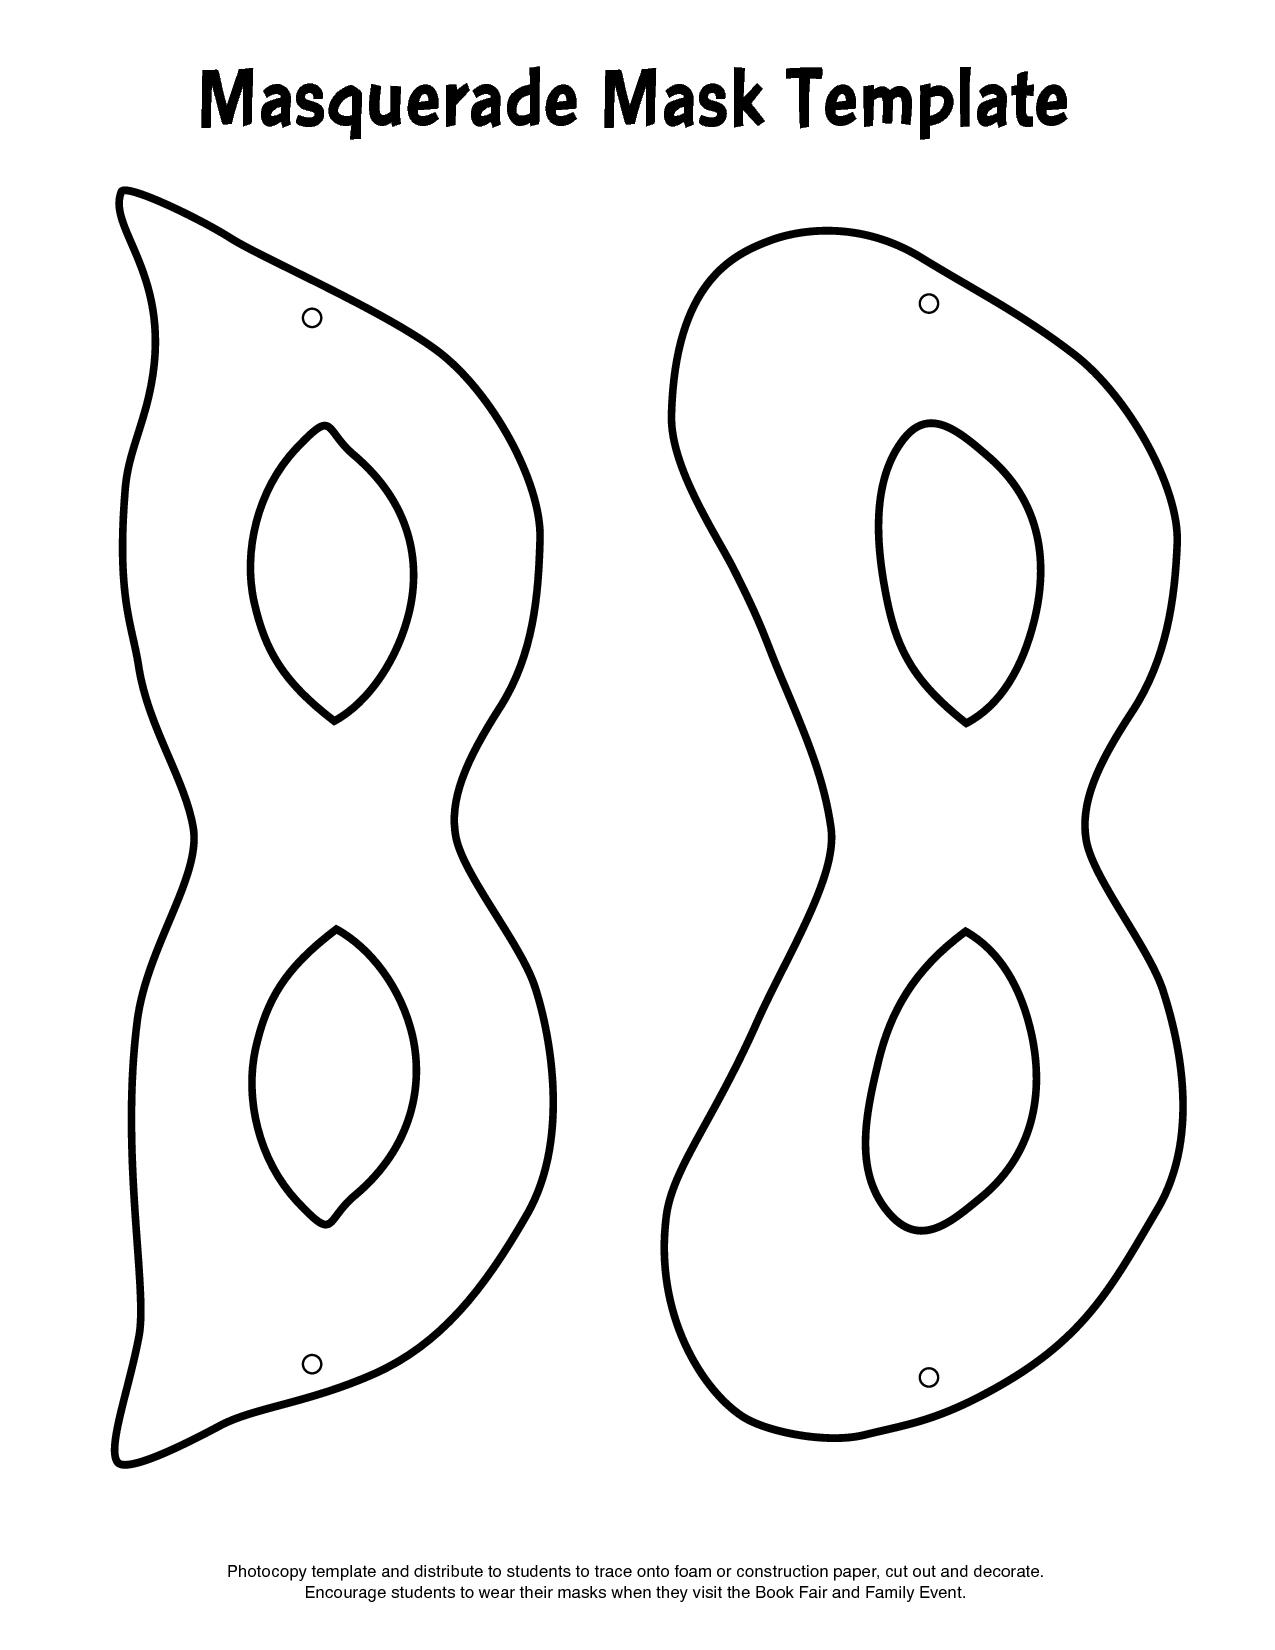 Free Printable Masquerade Masks - Babylon Yahoo! Search Results - Free Printable Paper Masks